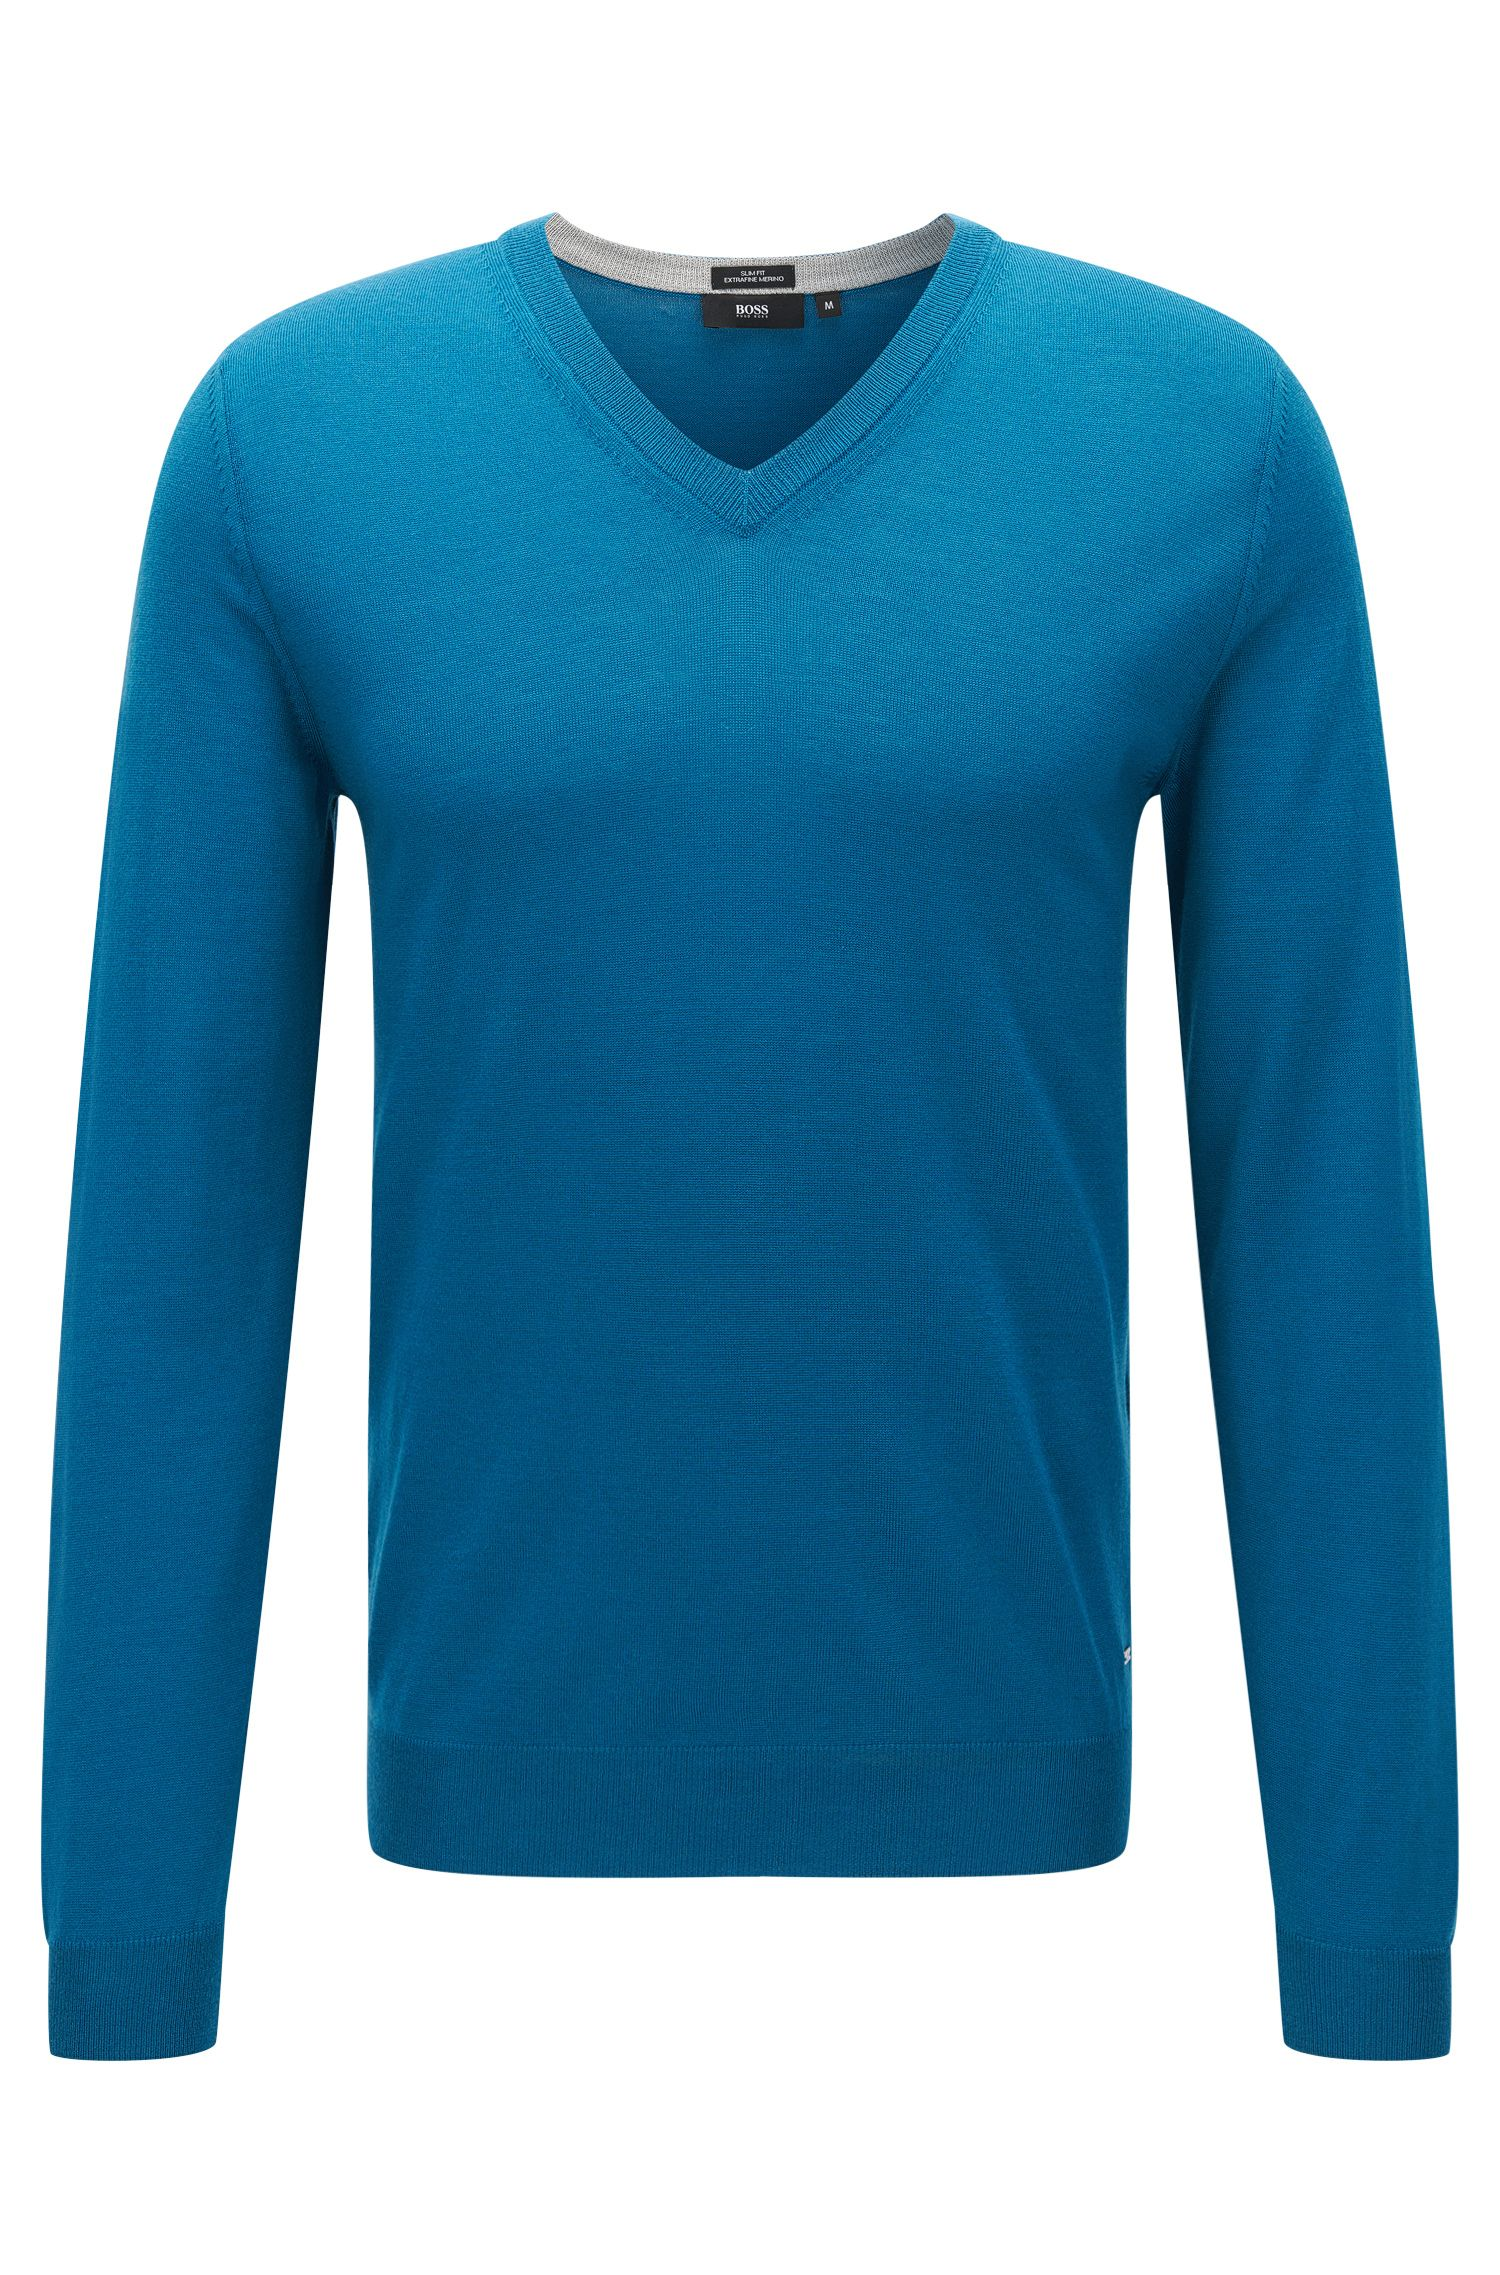 'Melba-M' | Slim Fit, Extra-Fine Virgin Merino Wool Sweater